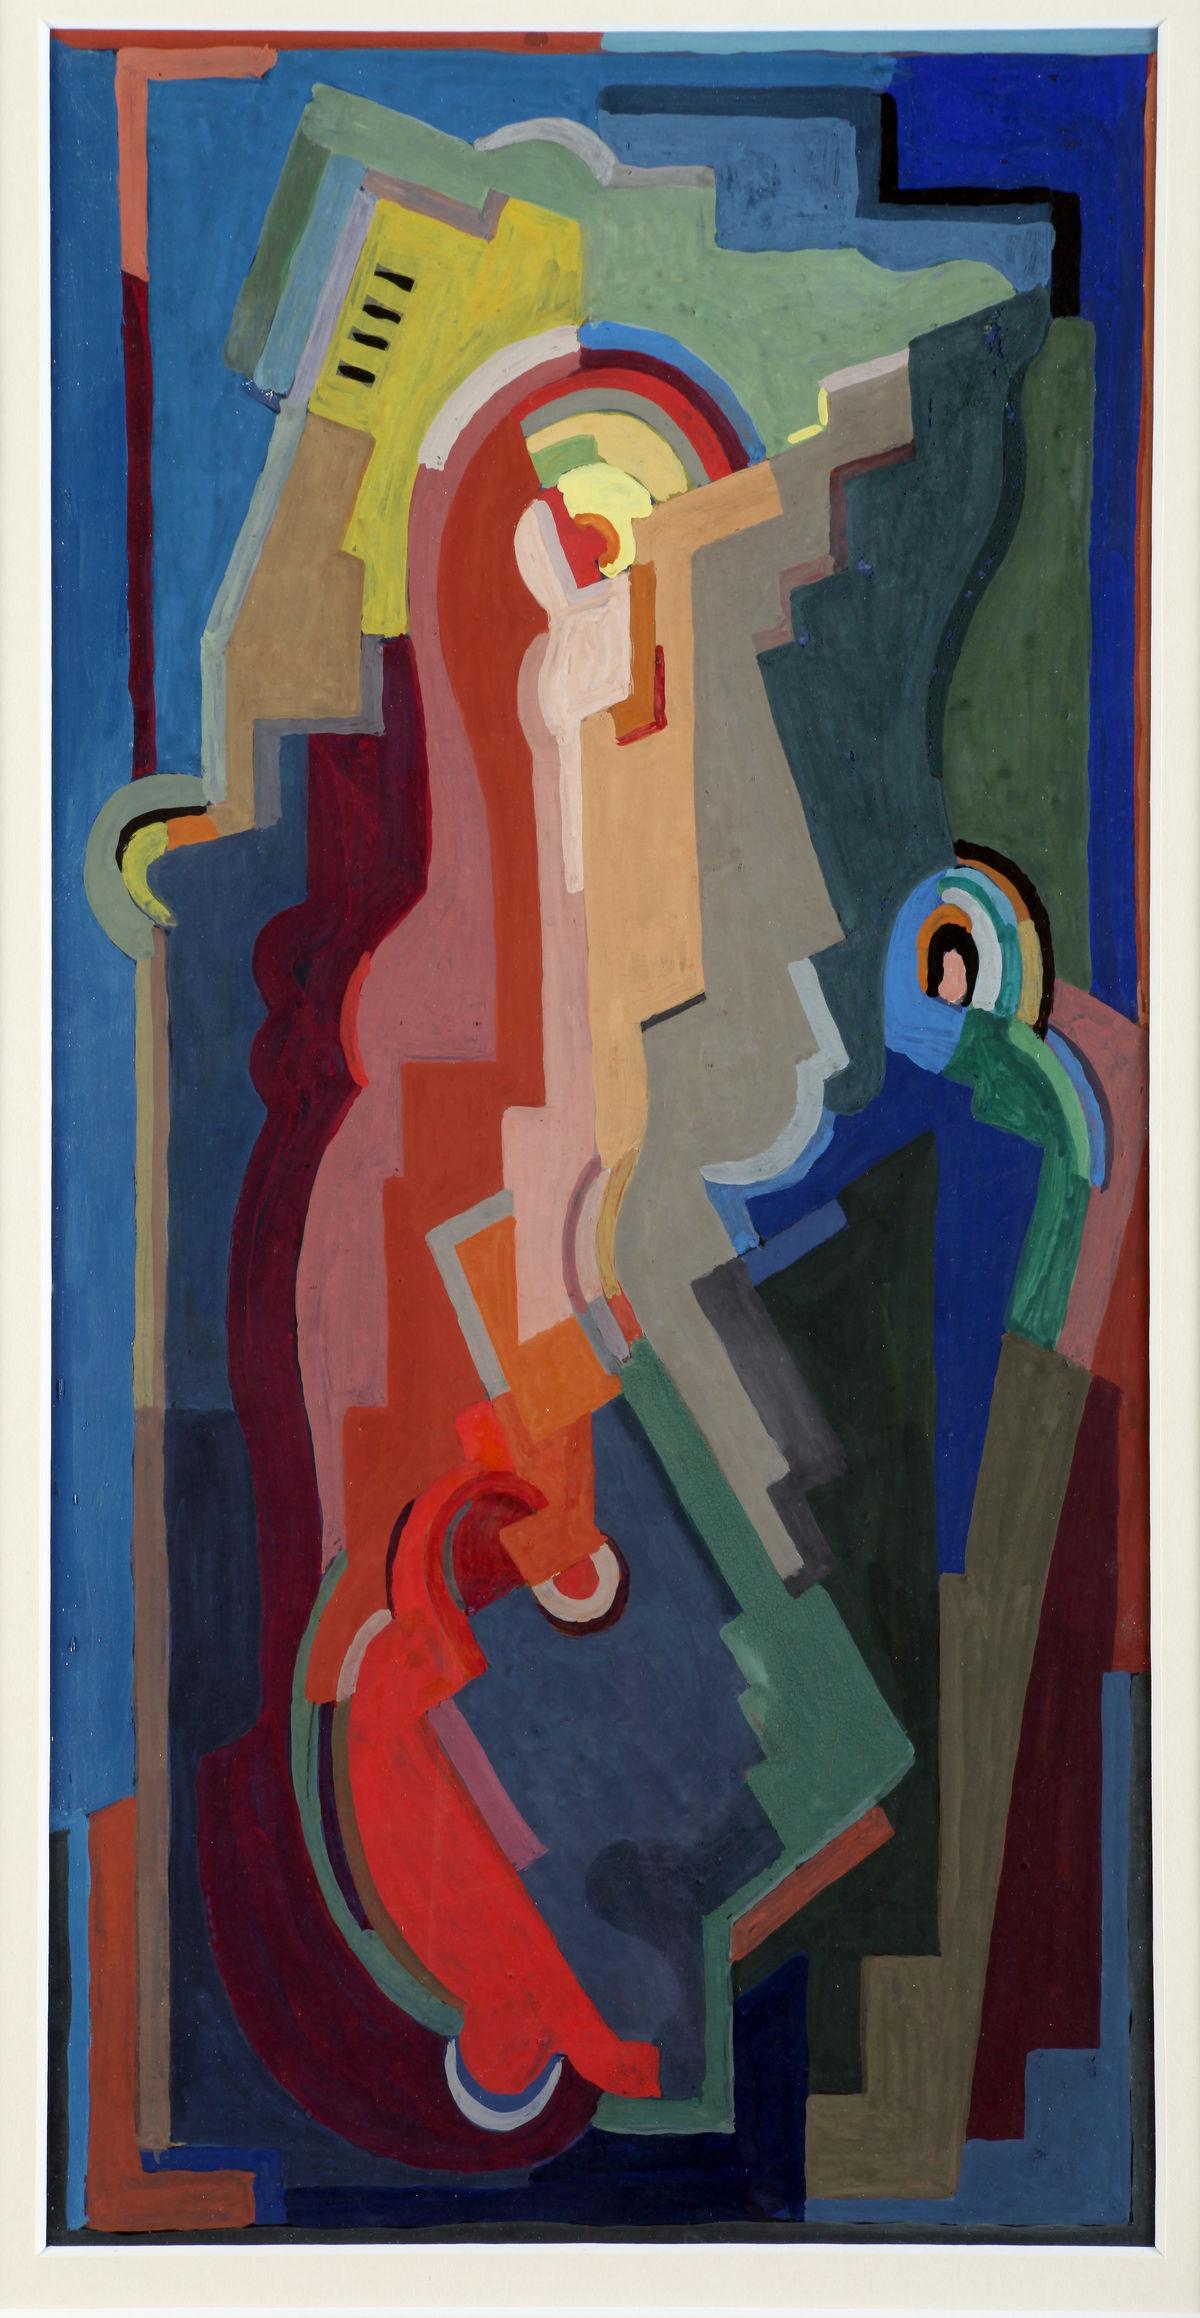 The Female Painter Whose Modern Art Shocked Ireland - Artsy